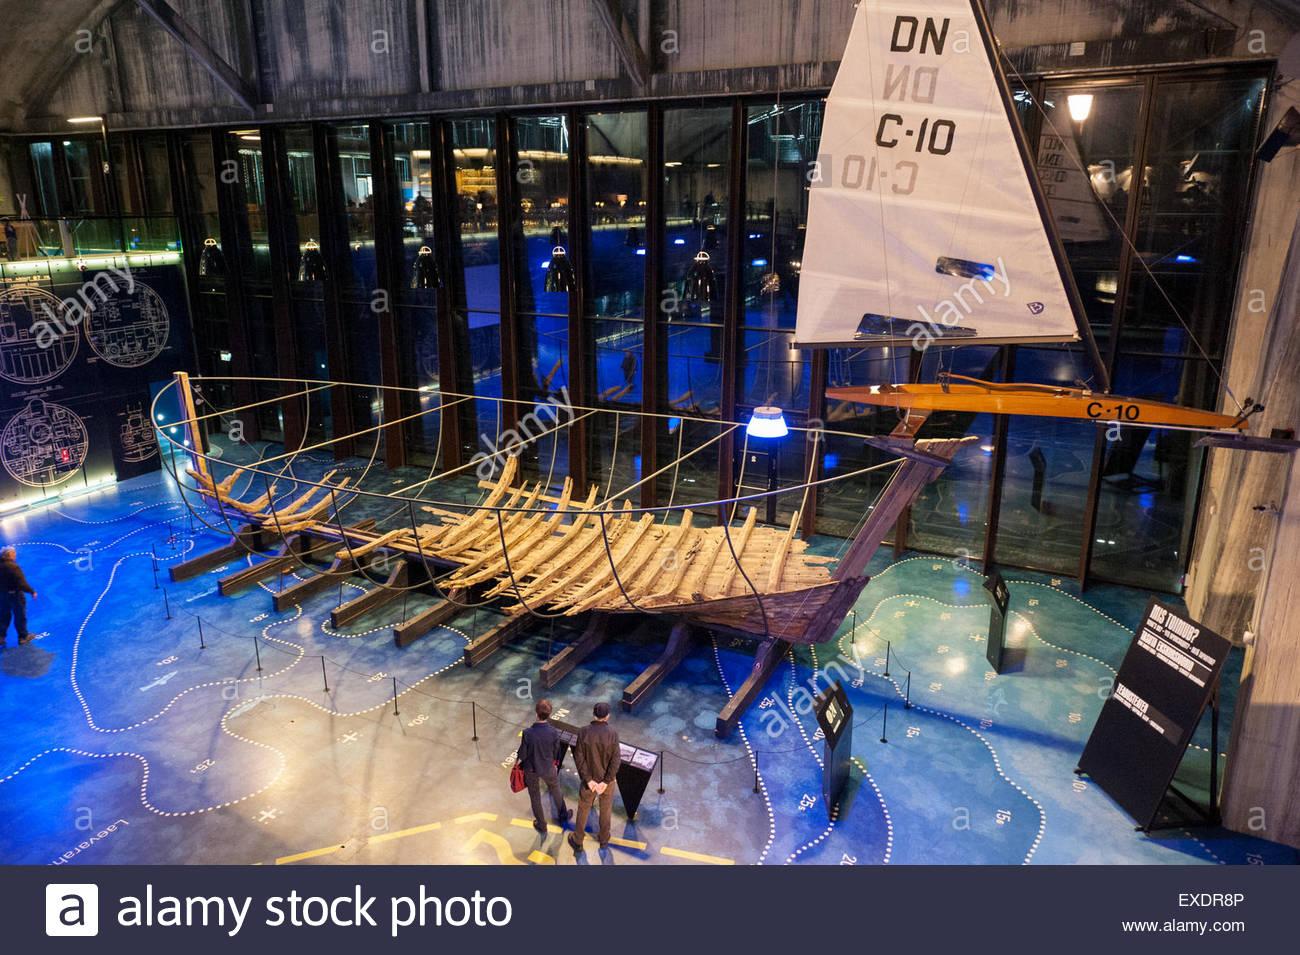 16th Century Ship Stock Photos & 16th Century Ship Stock Images.